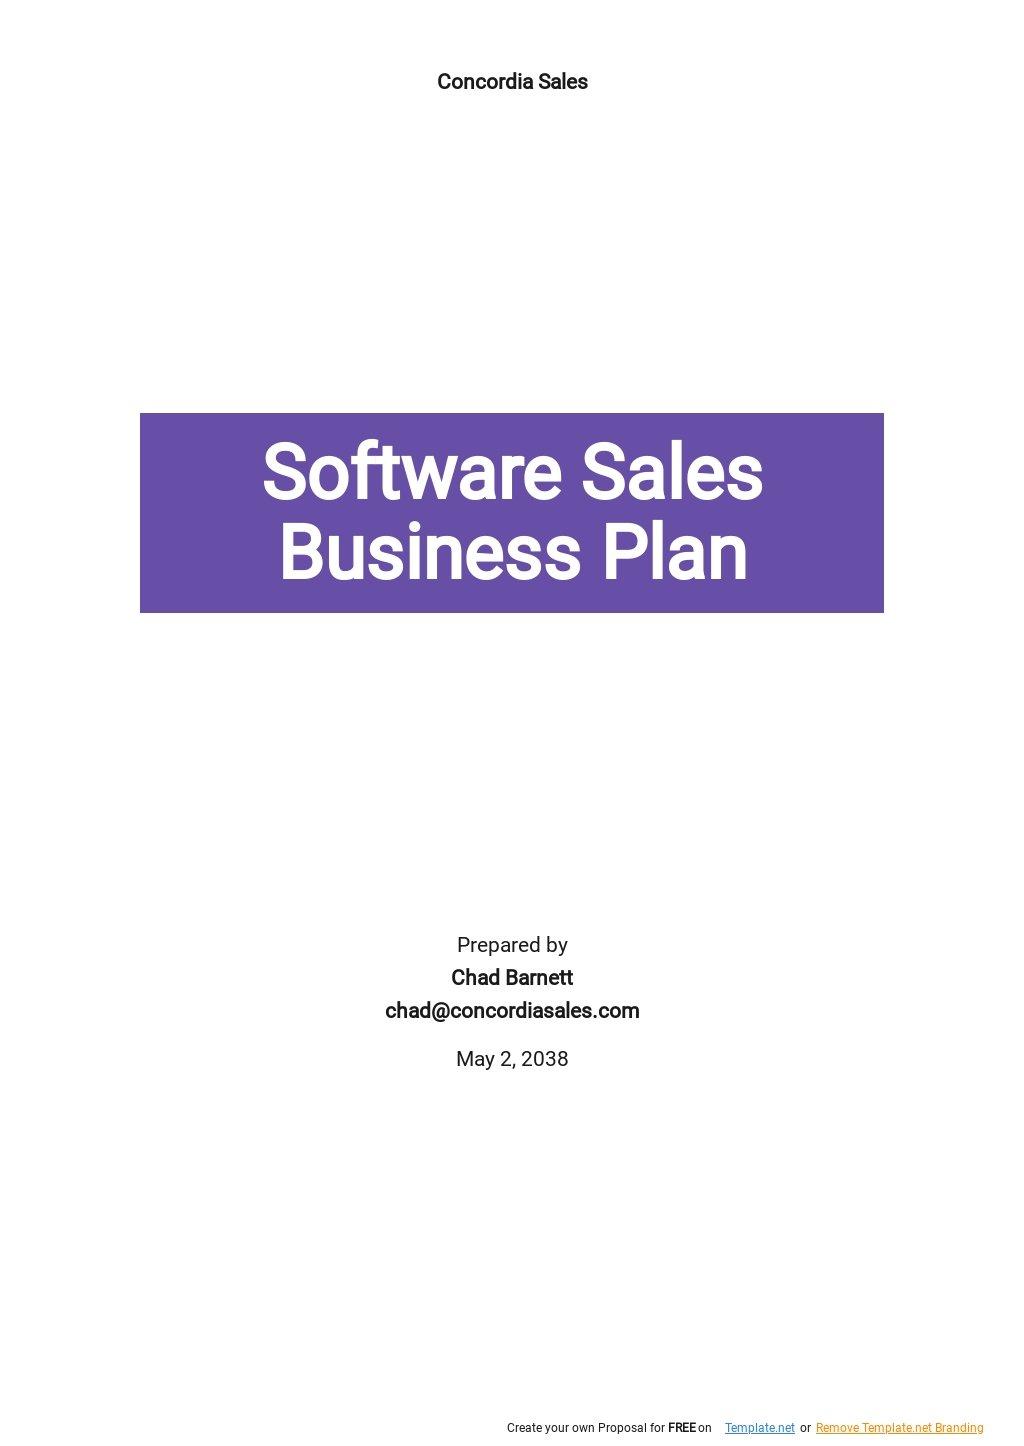 Software Sales Business Plan Template.jpe